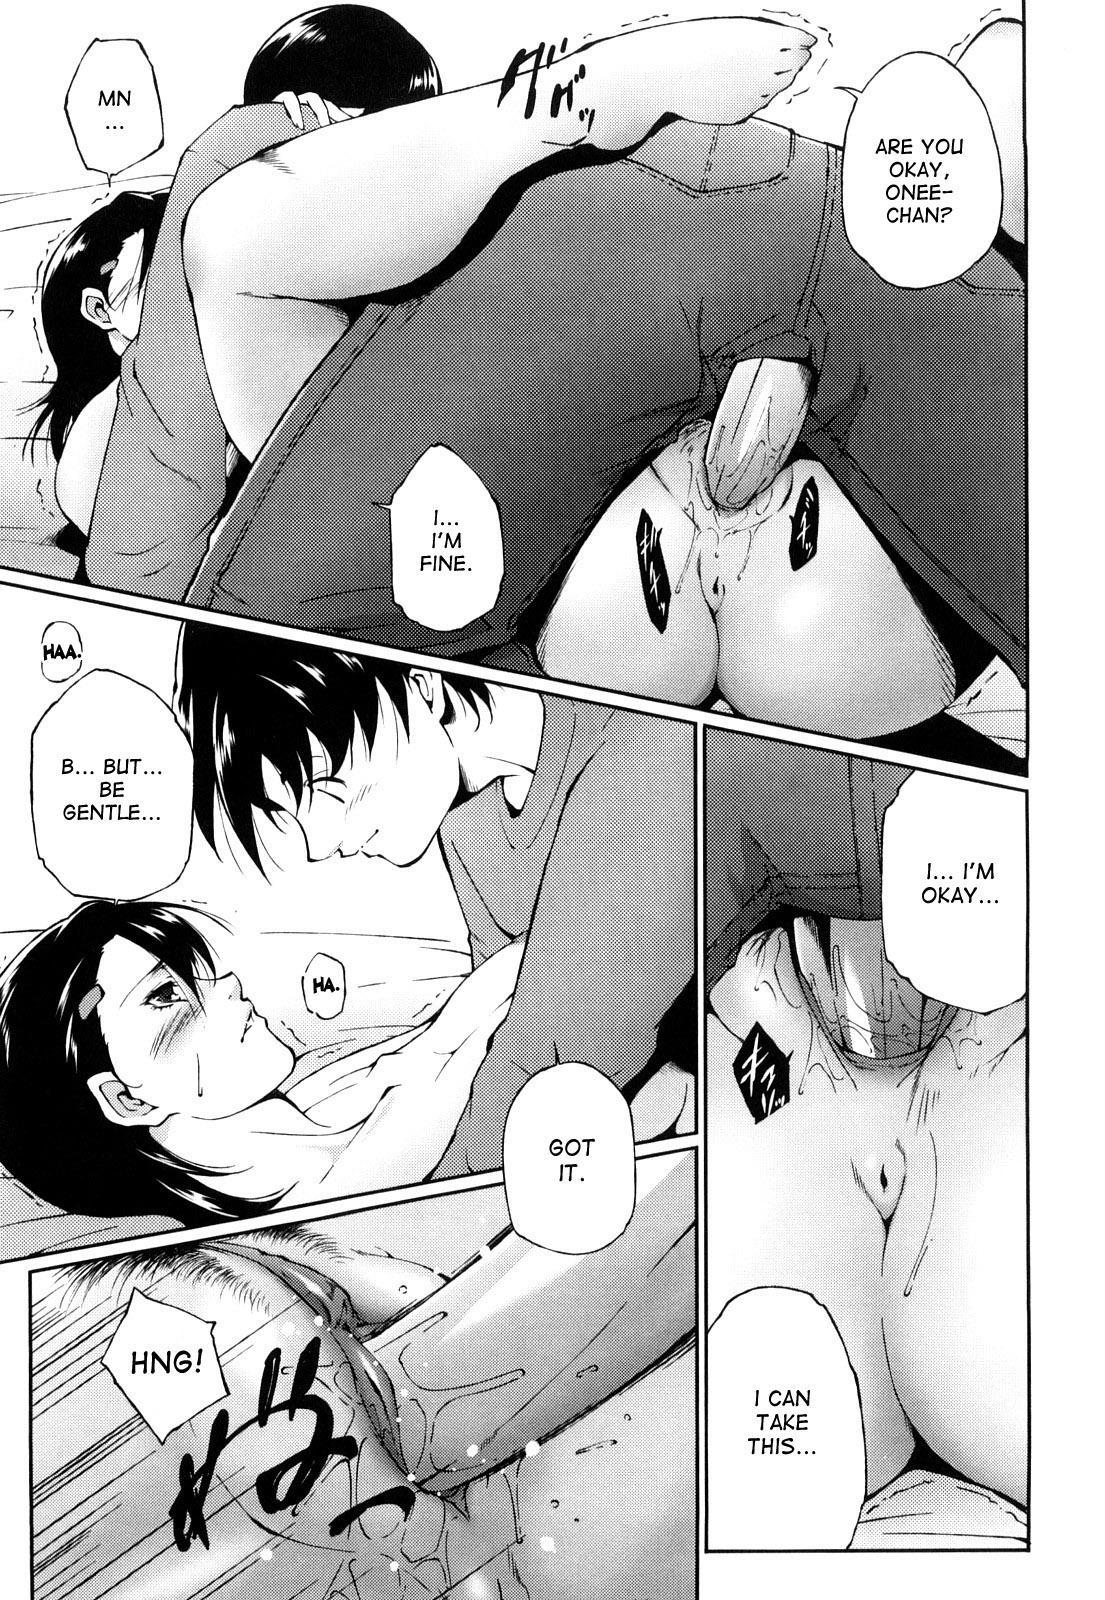 [Touma Itsuki] Ane-sama Inkou - Sister's Sexy Smell Ch. 1-6 [English] [desudesu] [Decensored] 60